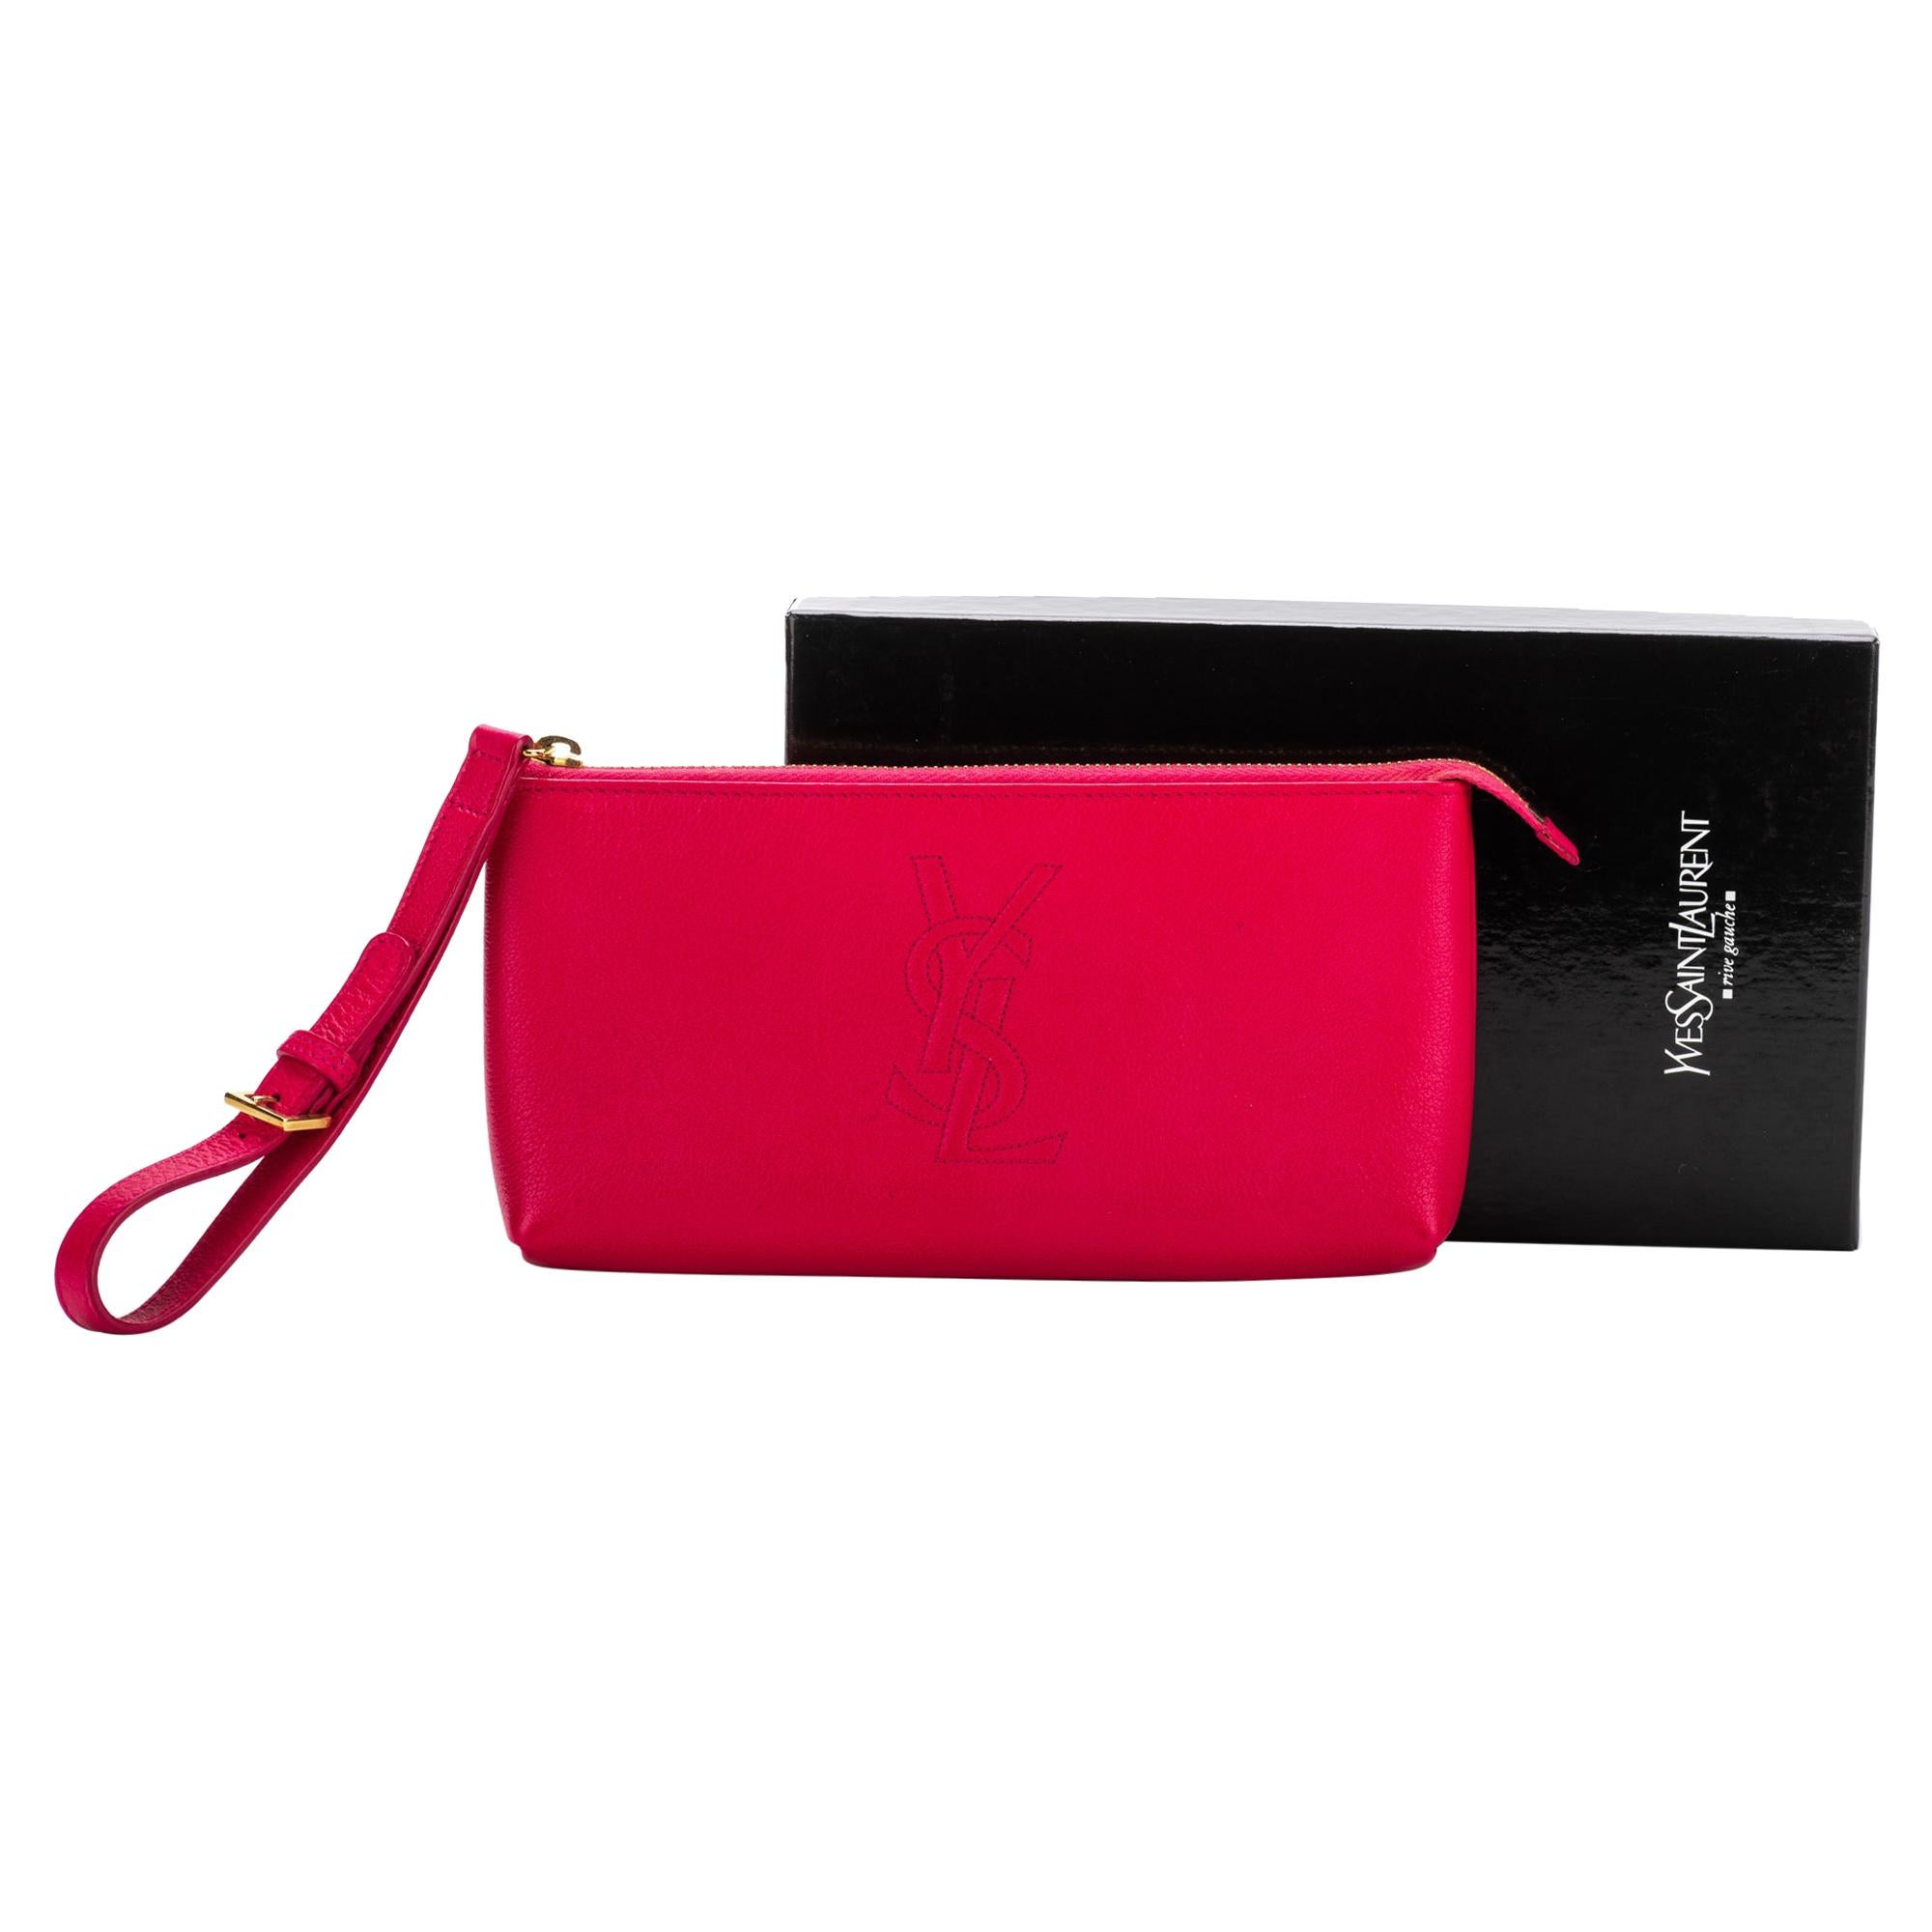 YSL Fuchsia Leather Wristlet Small Bag